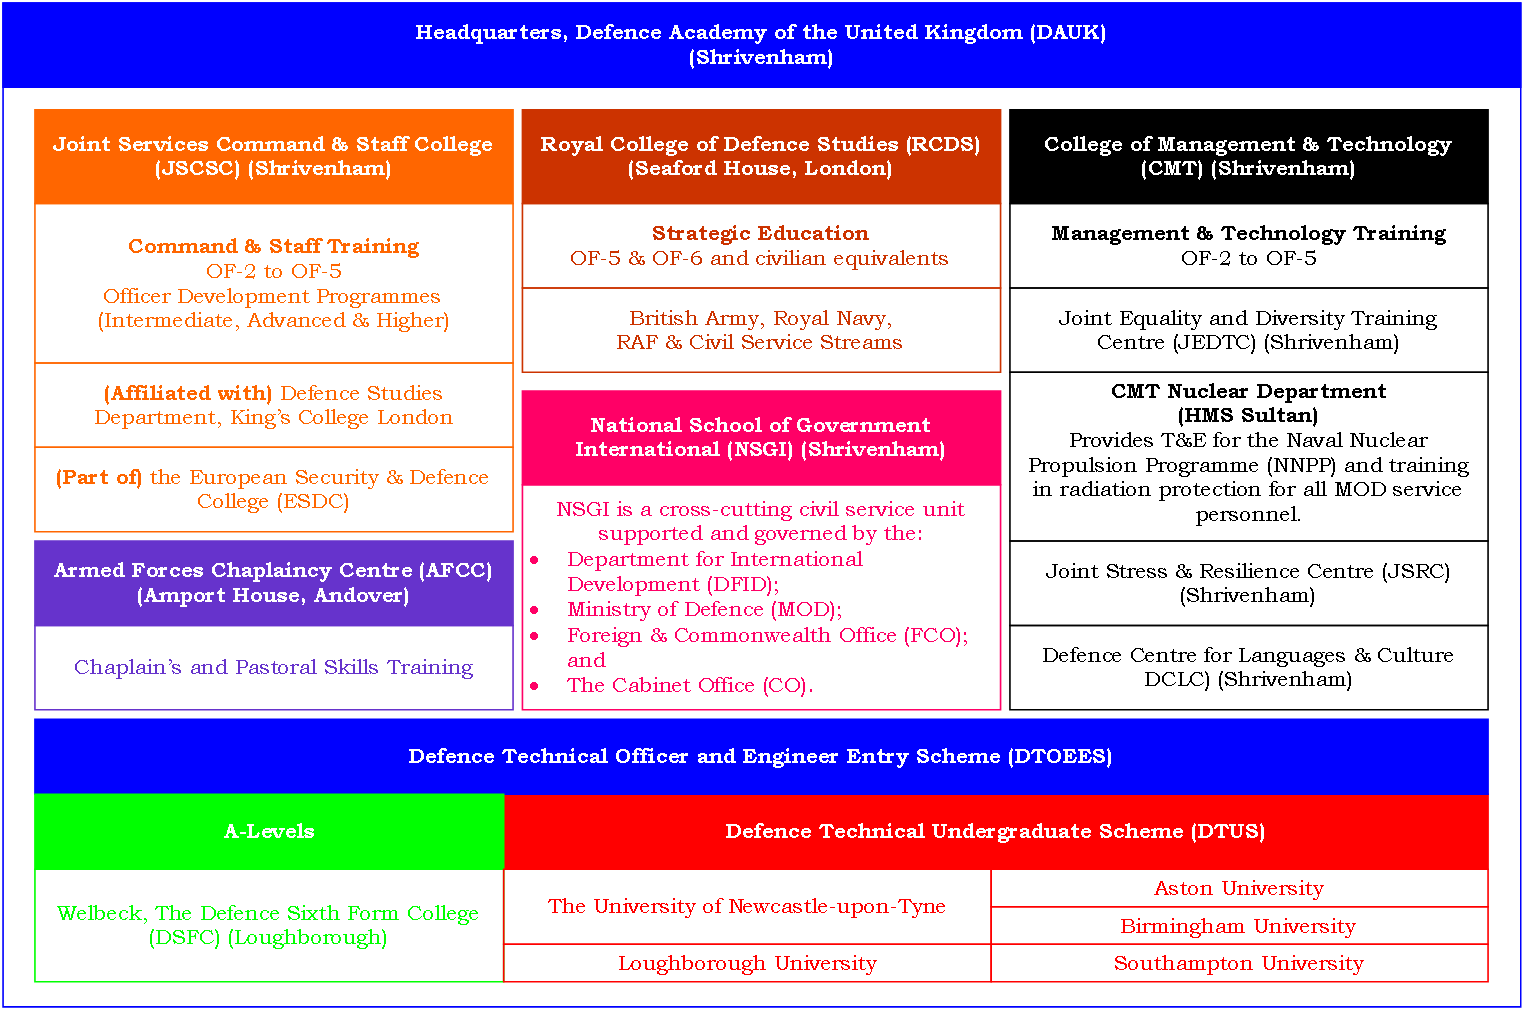 Figure1: DAUK Organisation